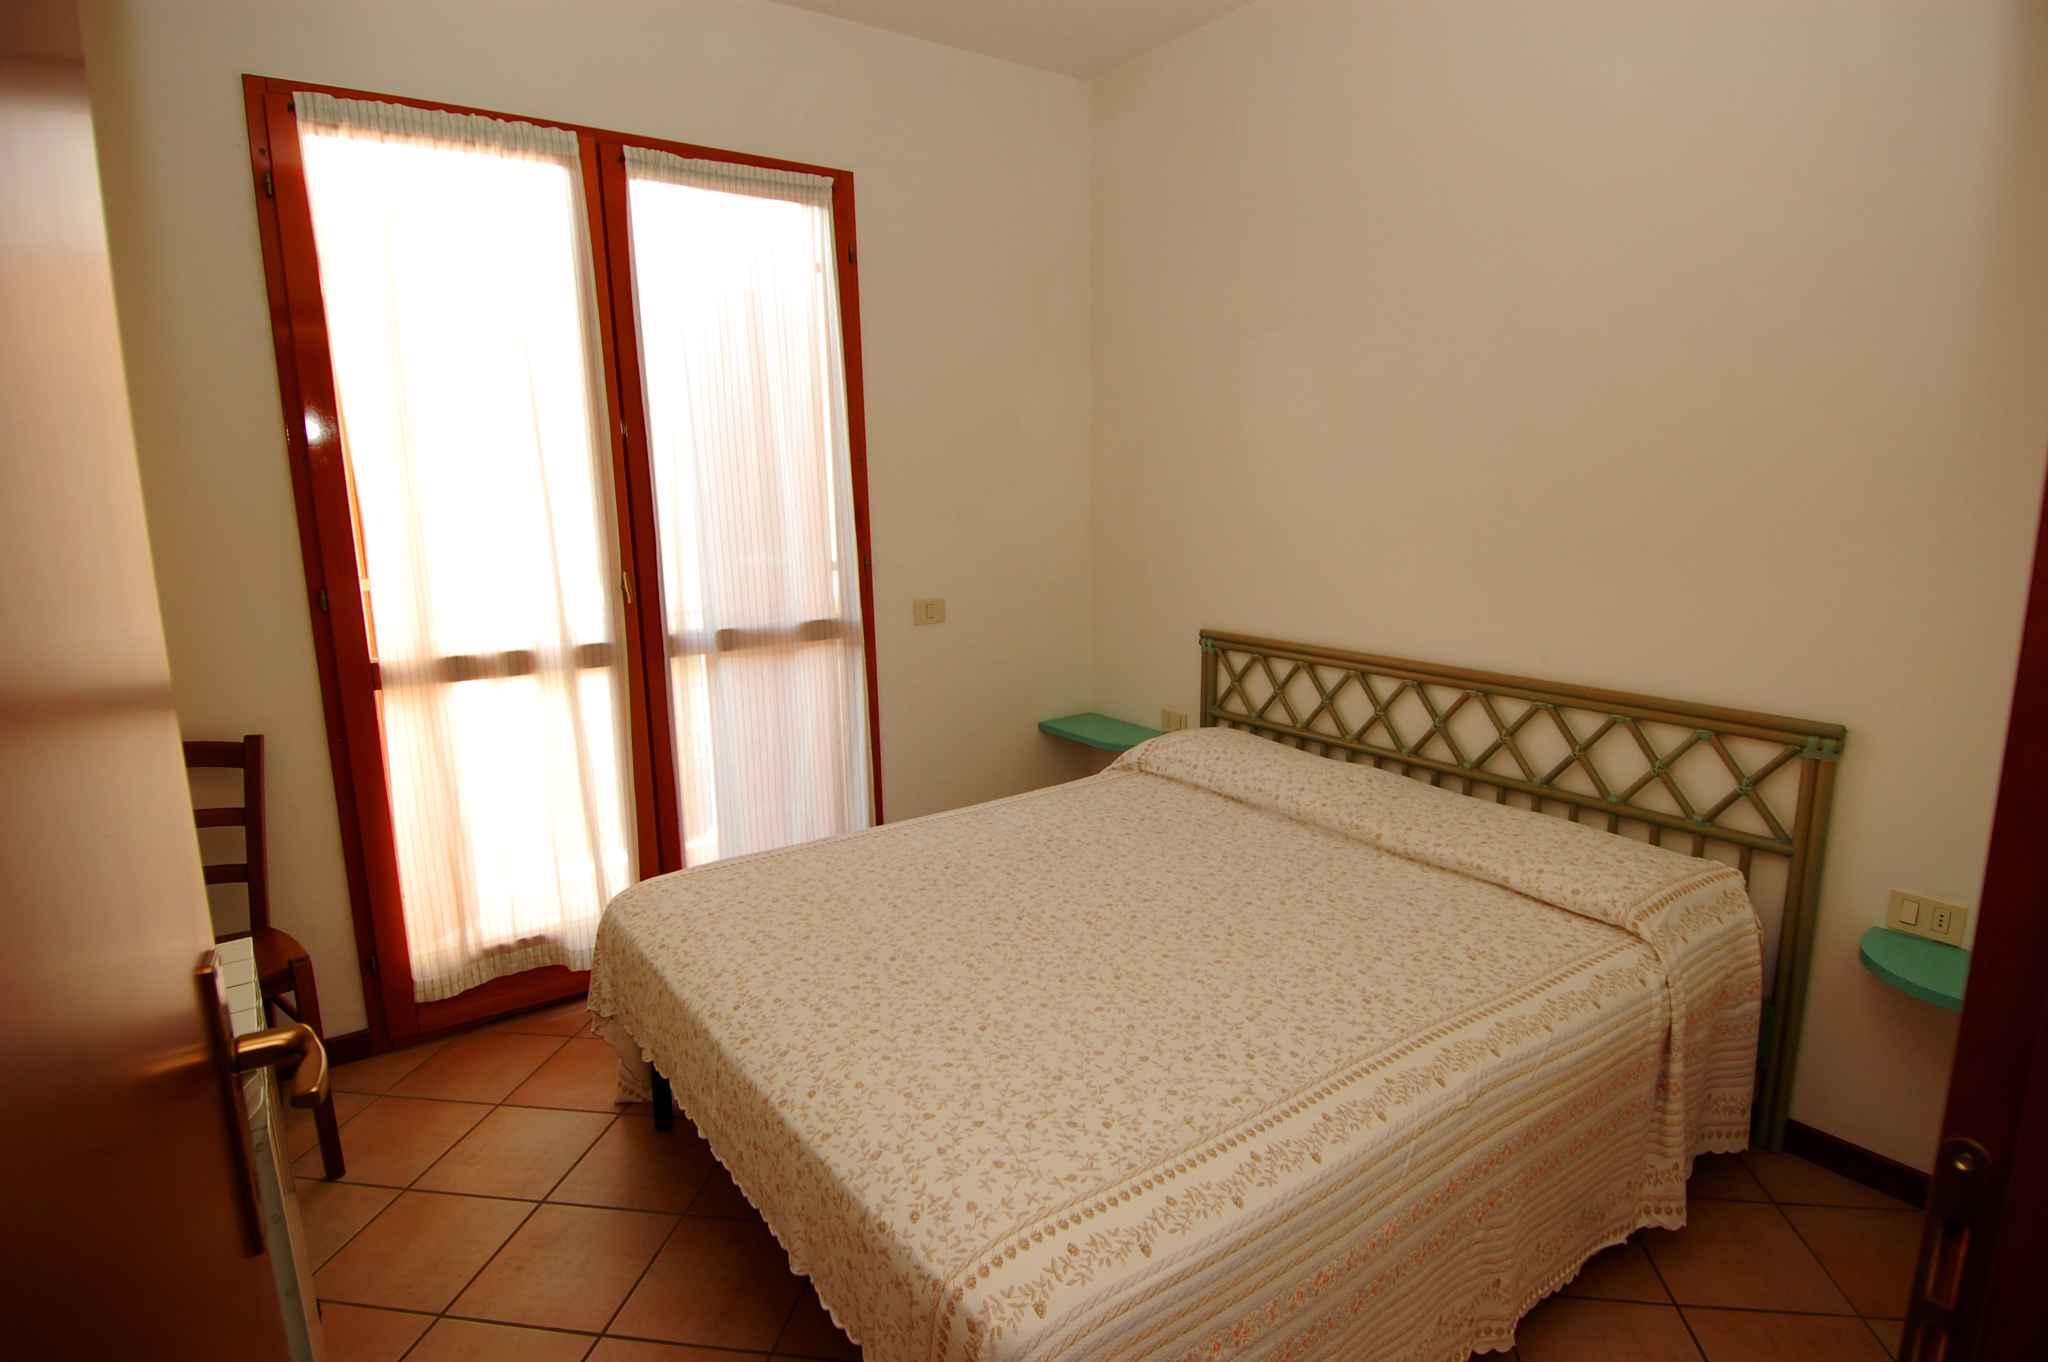 Ferienhaus mit Pool und Grill (284304), Rosolina Mare, Rovigo, Venetien, Italien, Bild 19